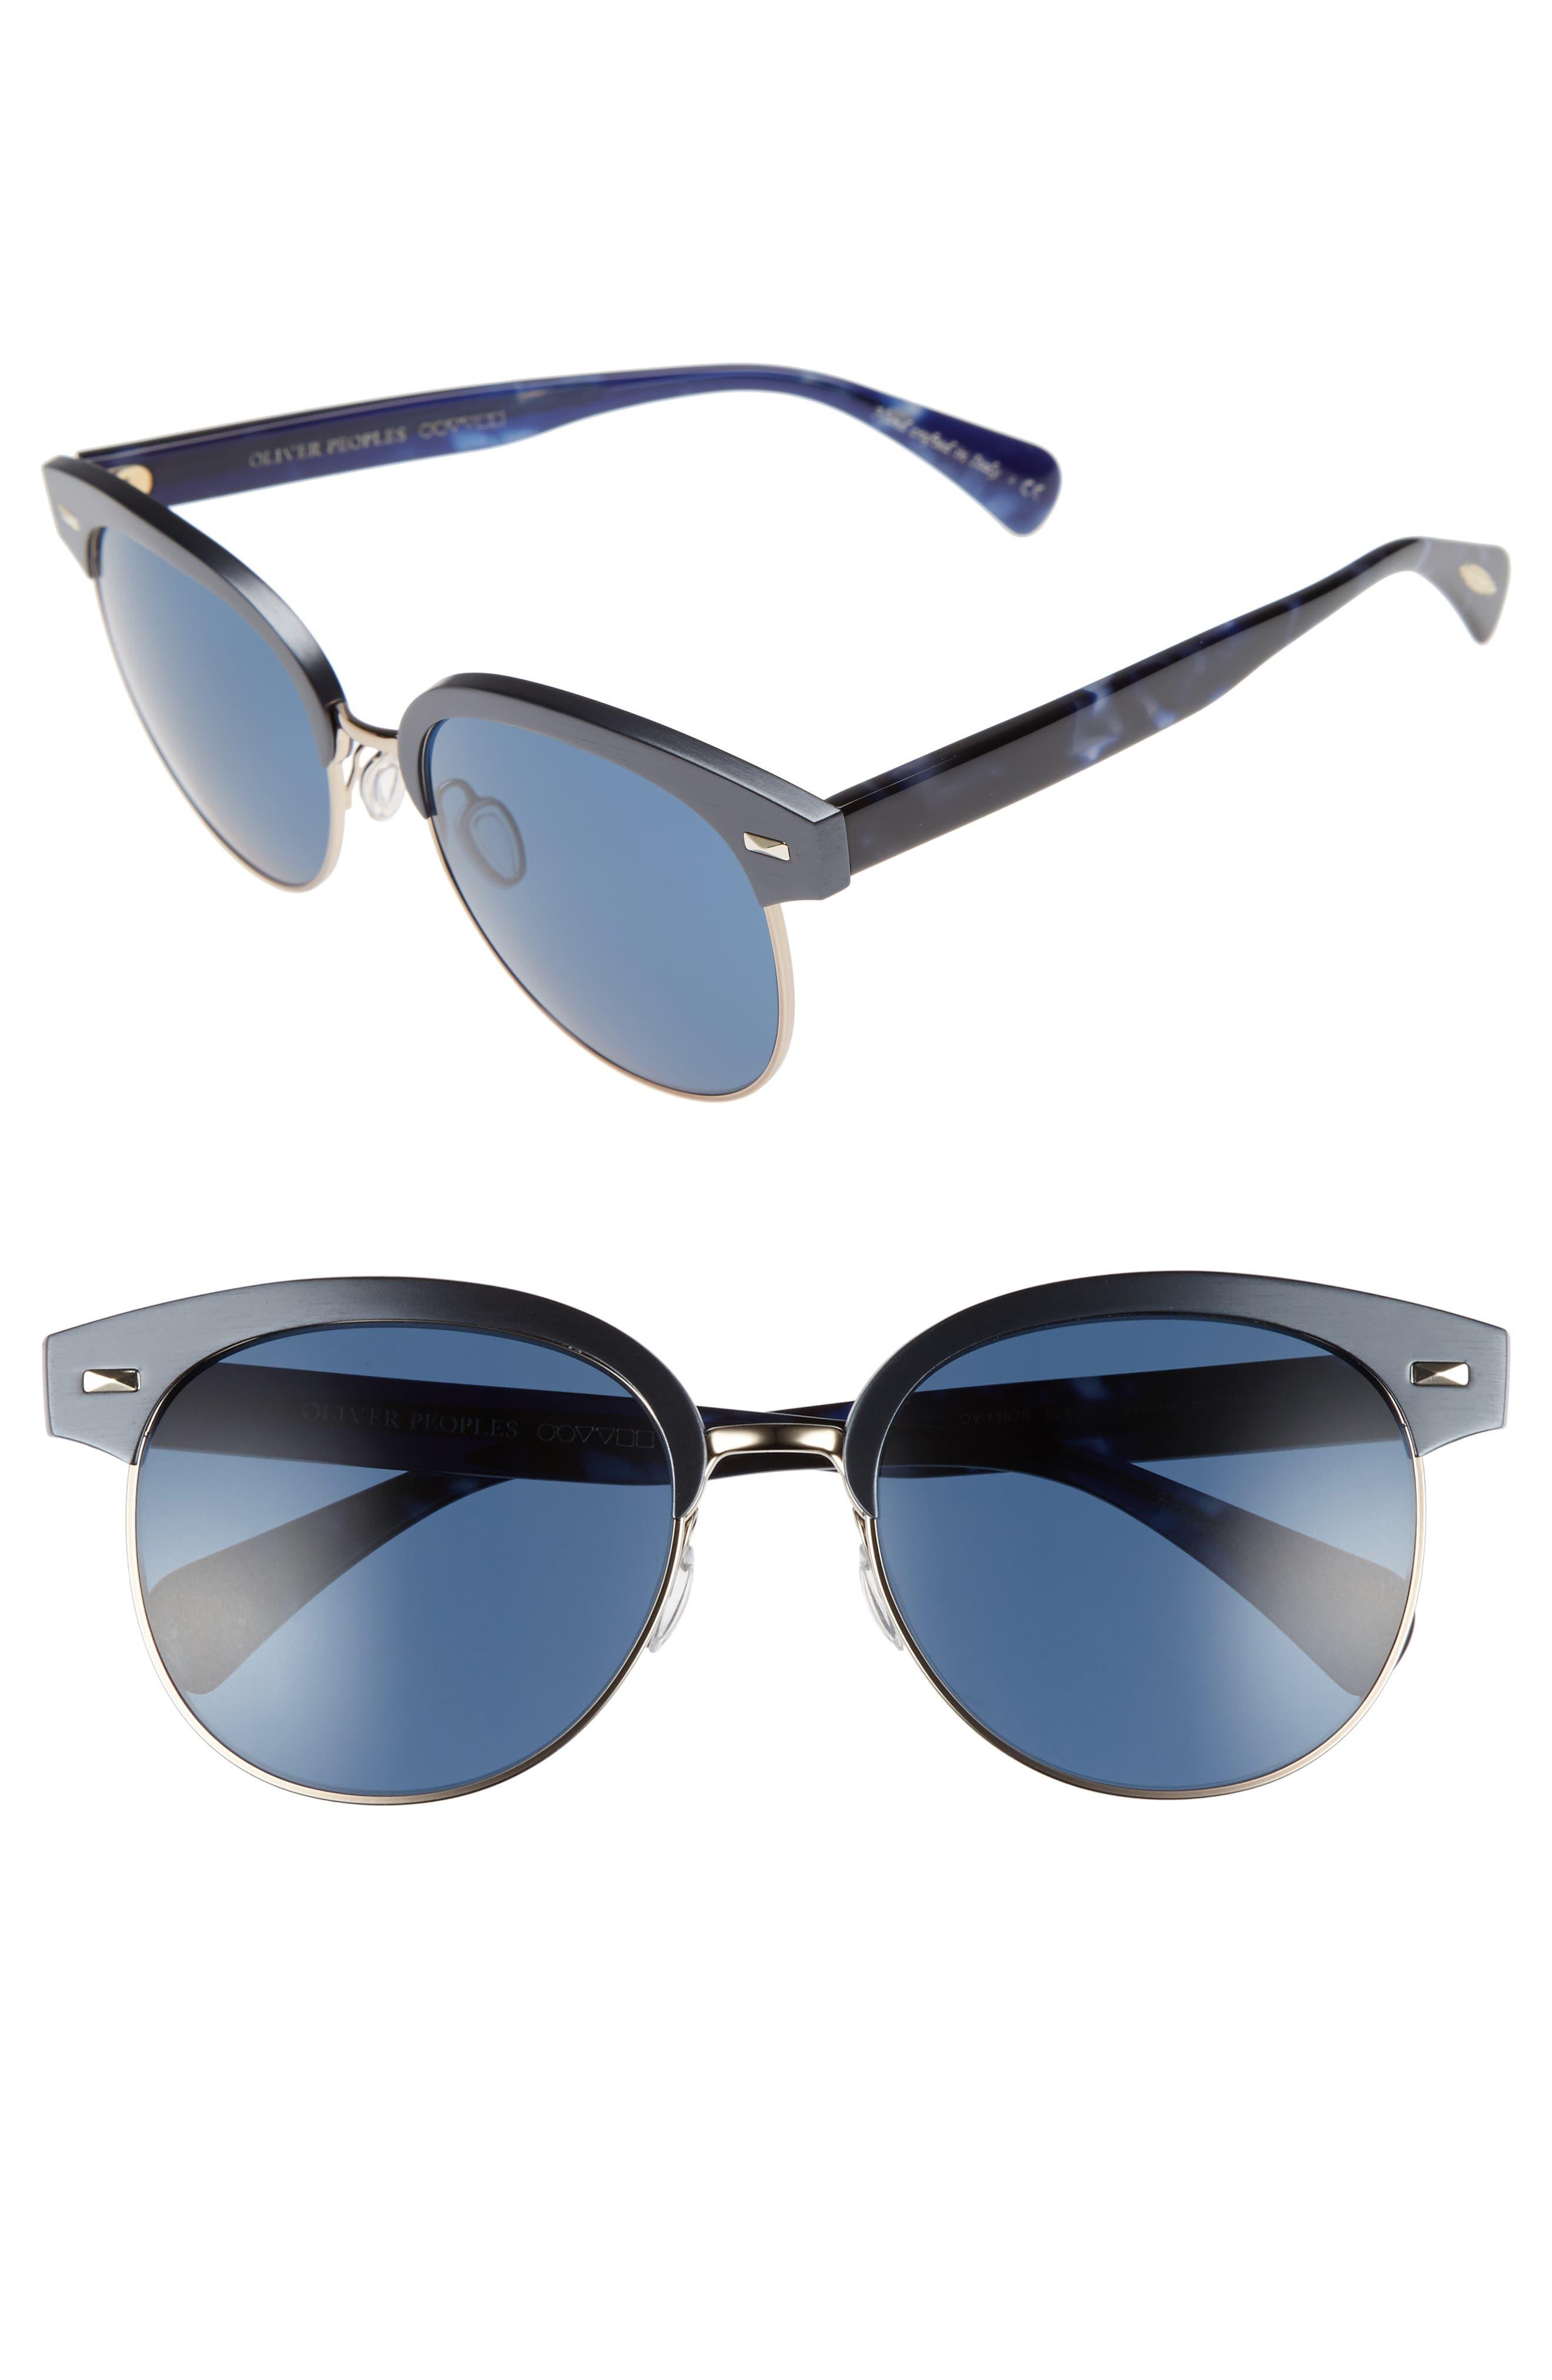 Main Image - Oliver Peoples Shaelie 55mm Mirrored Semi-Rim Sunglasses